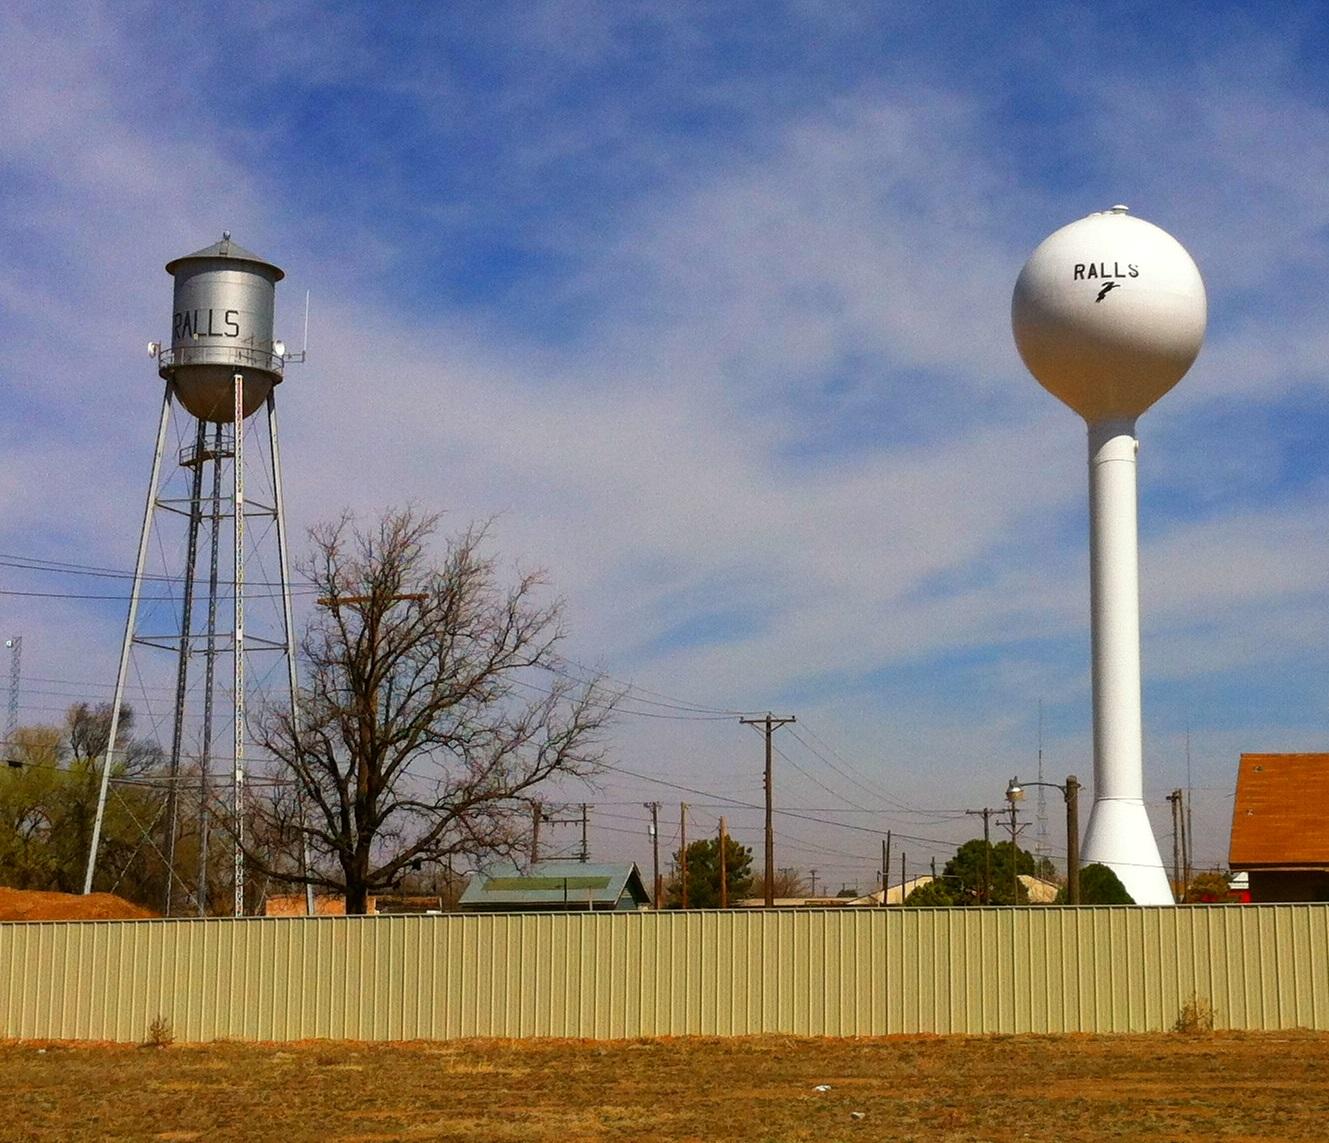 رالز، تگزاس